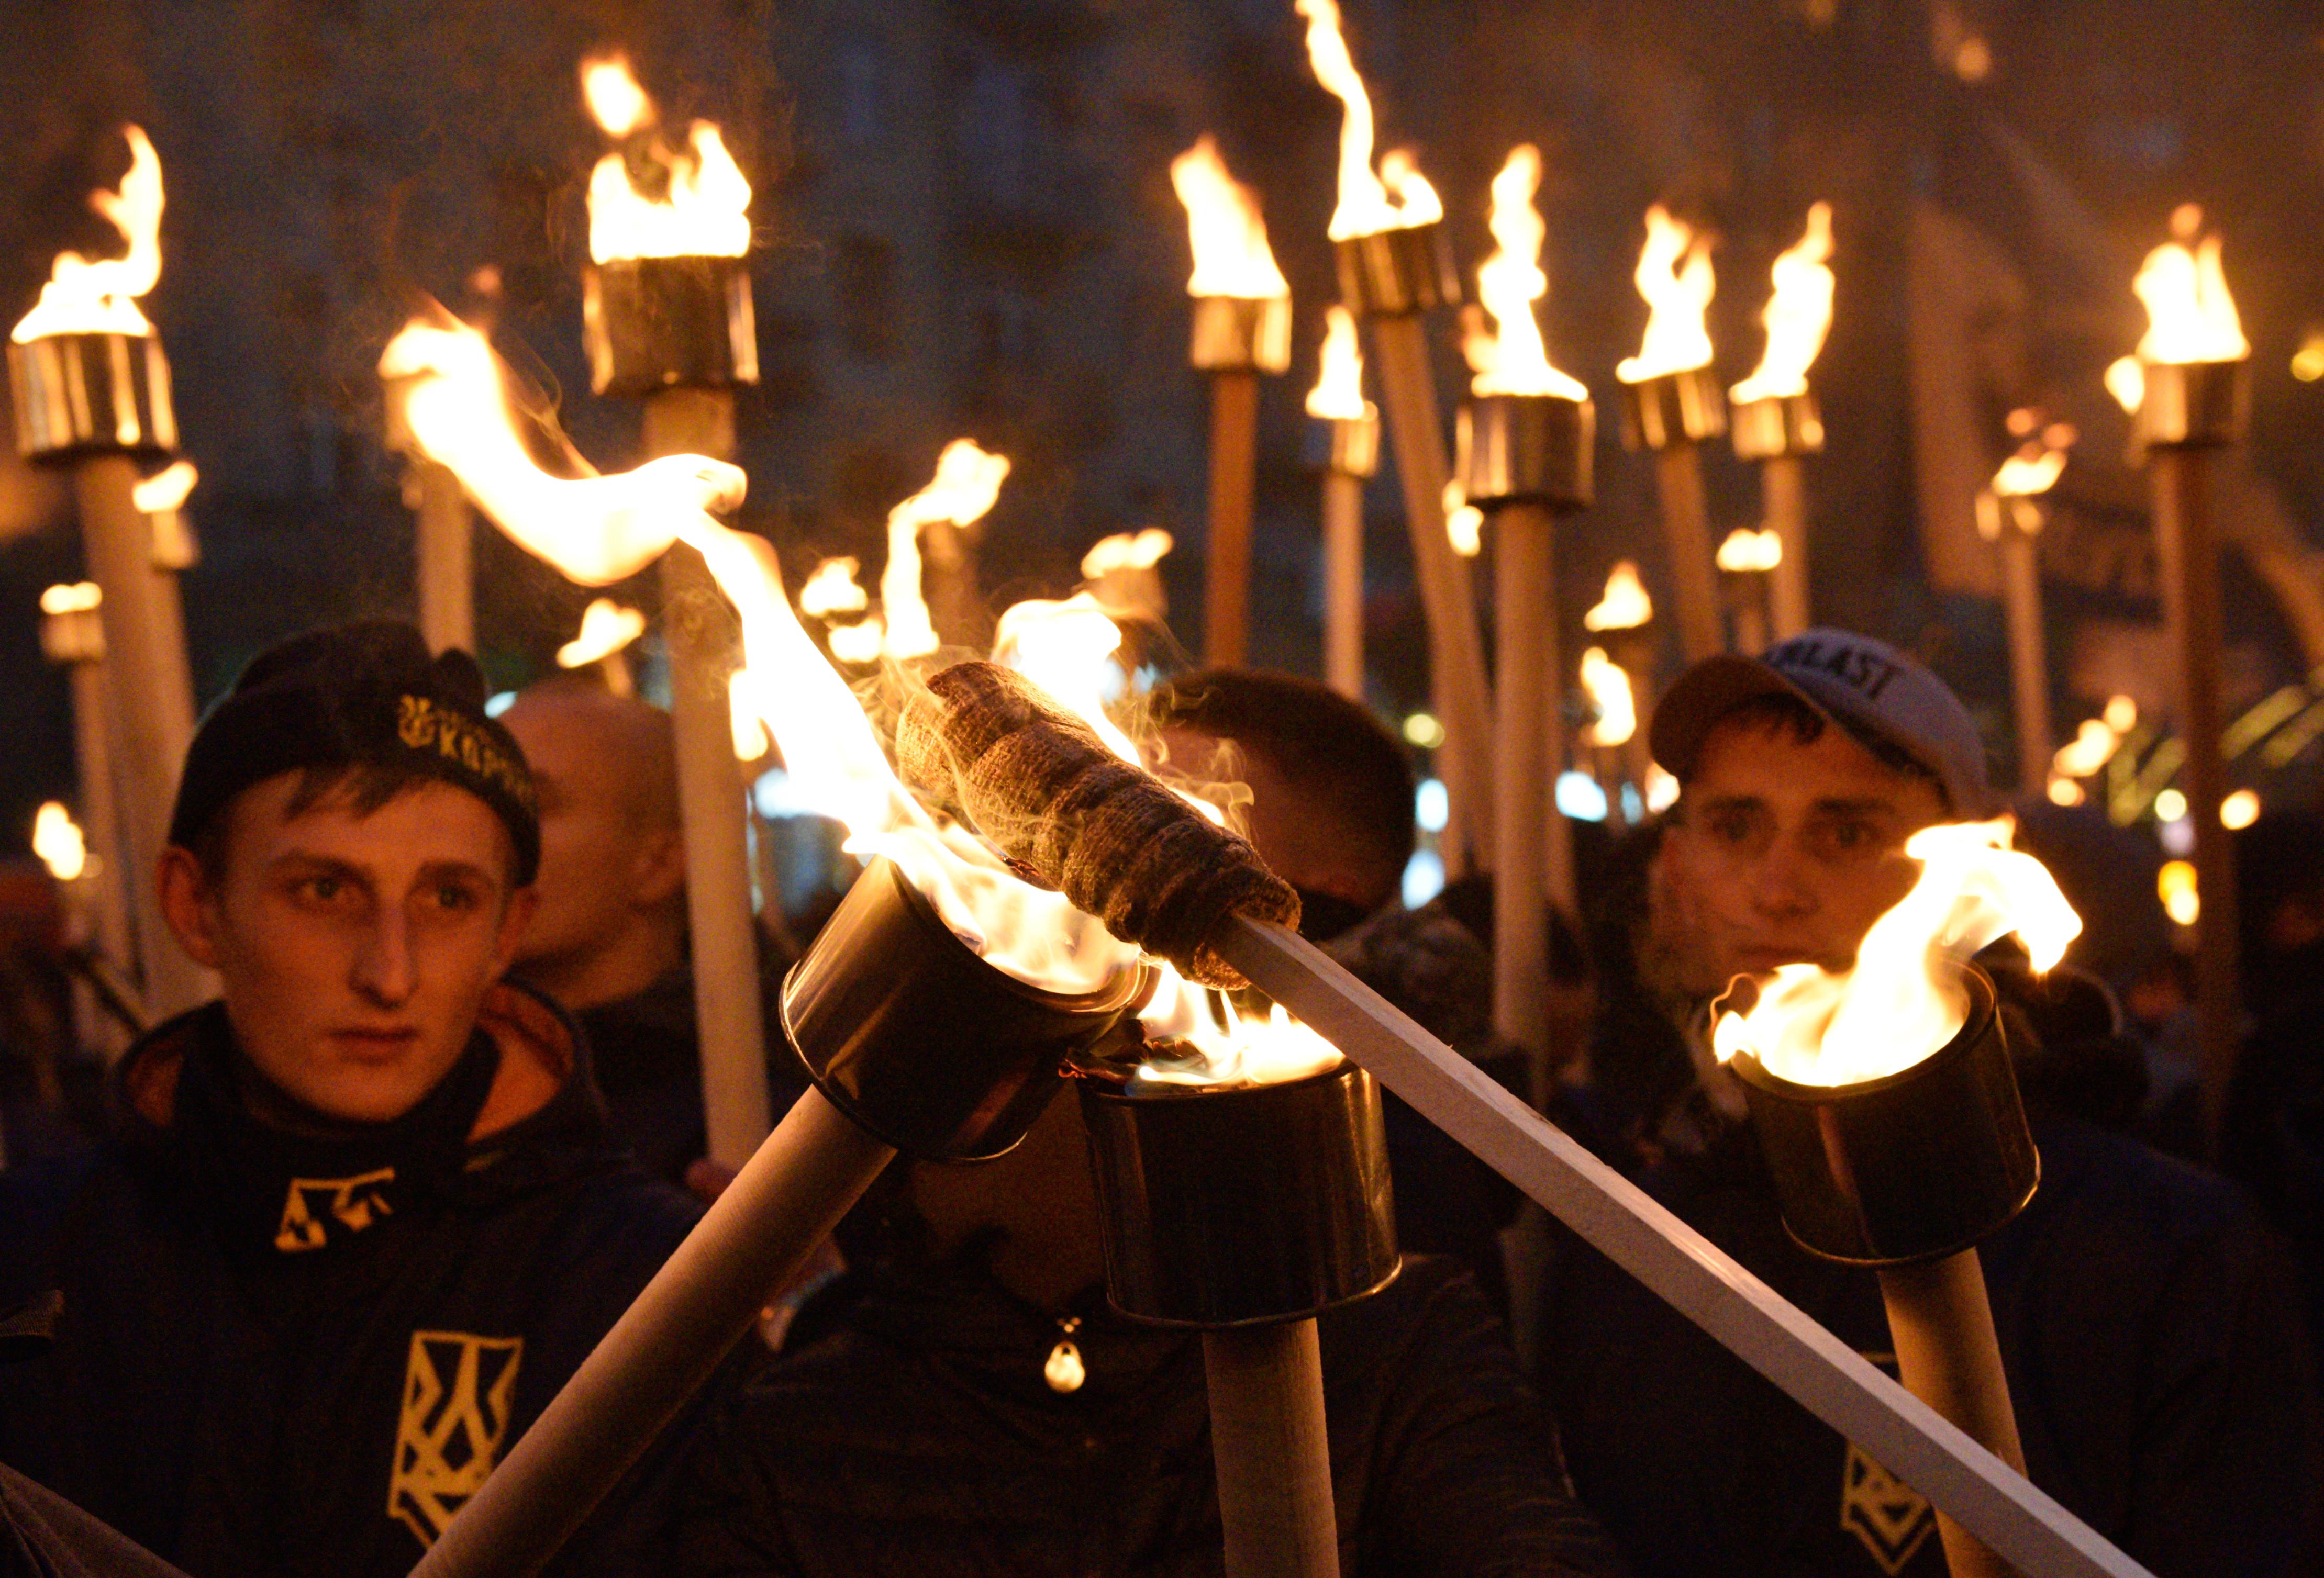 <p>Марш националистов в Киеве. Фото: &copy; РИА Новости</p>